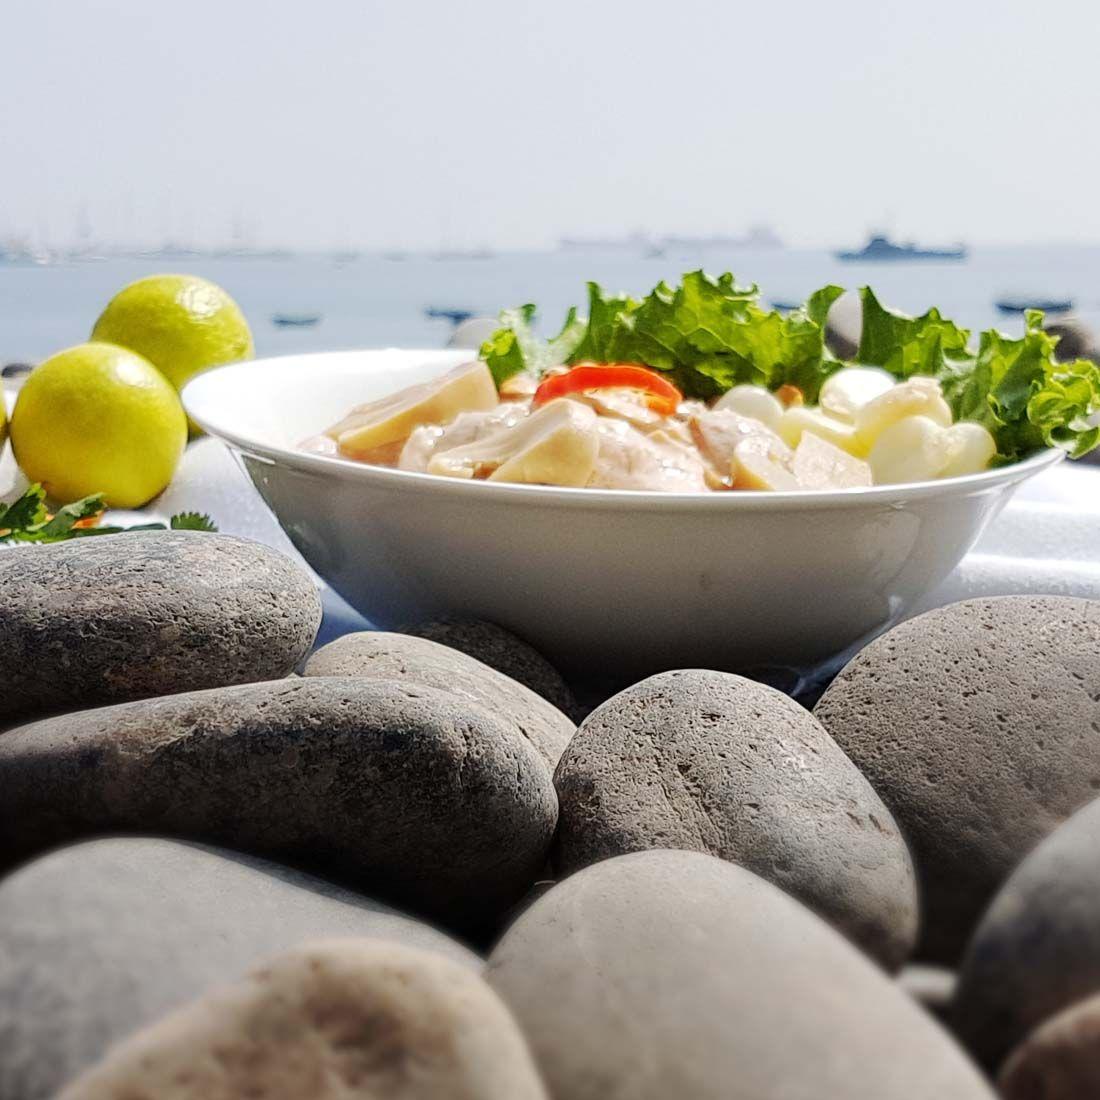 EL COLORAO DE CHUCUITO Restaurant - and Peruvian Food FISH AND SEAFOOD - CALLAO - MESA 24/7 Guide | LIMA - Peru